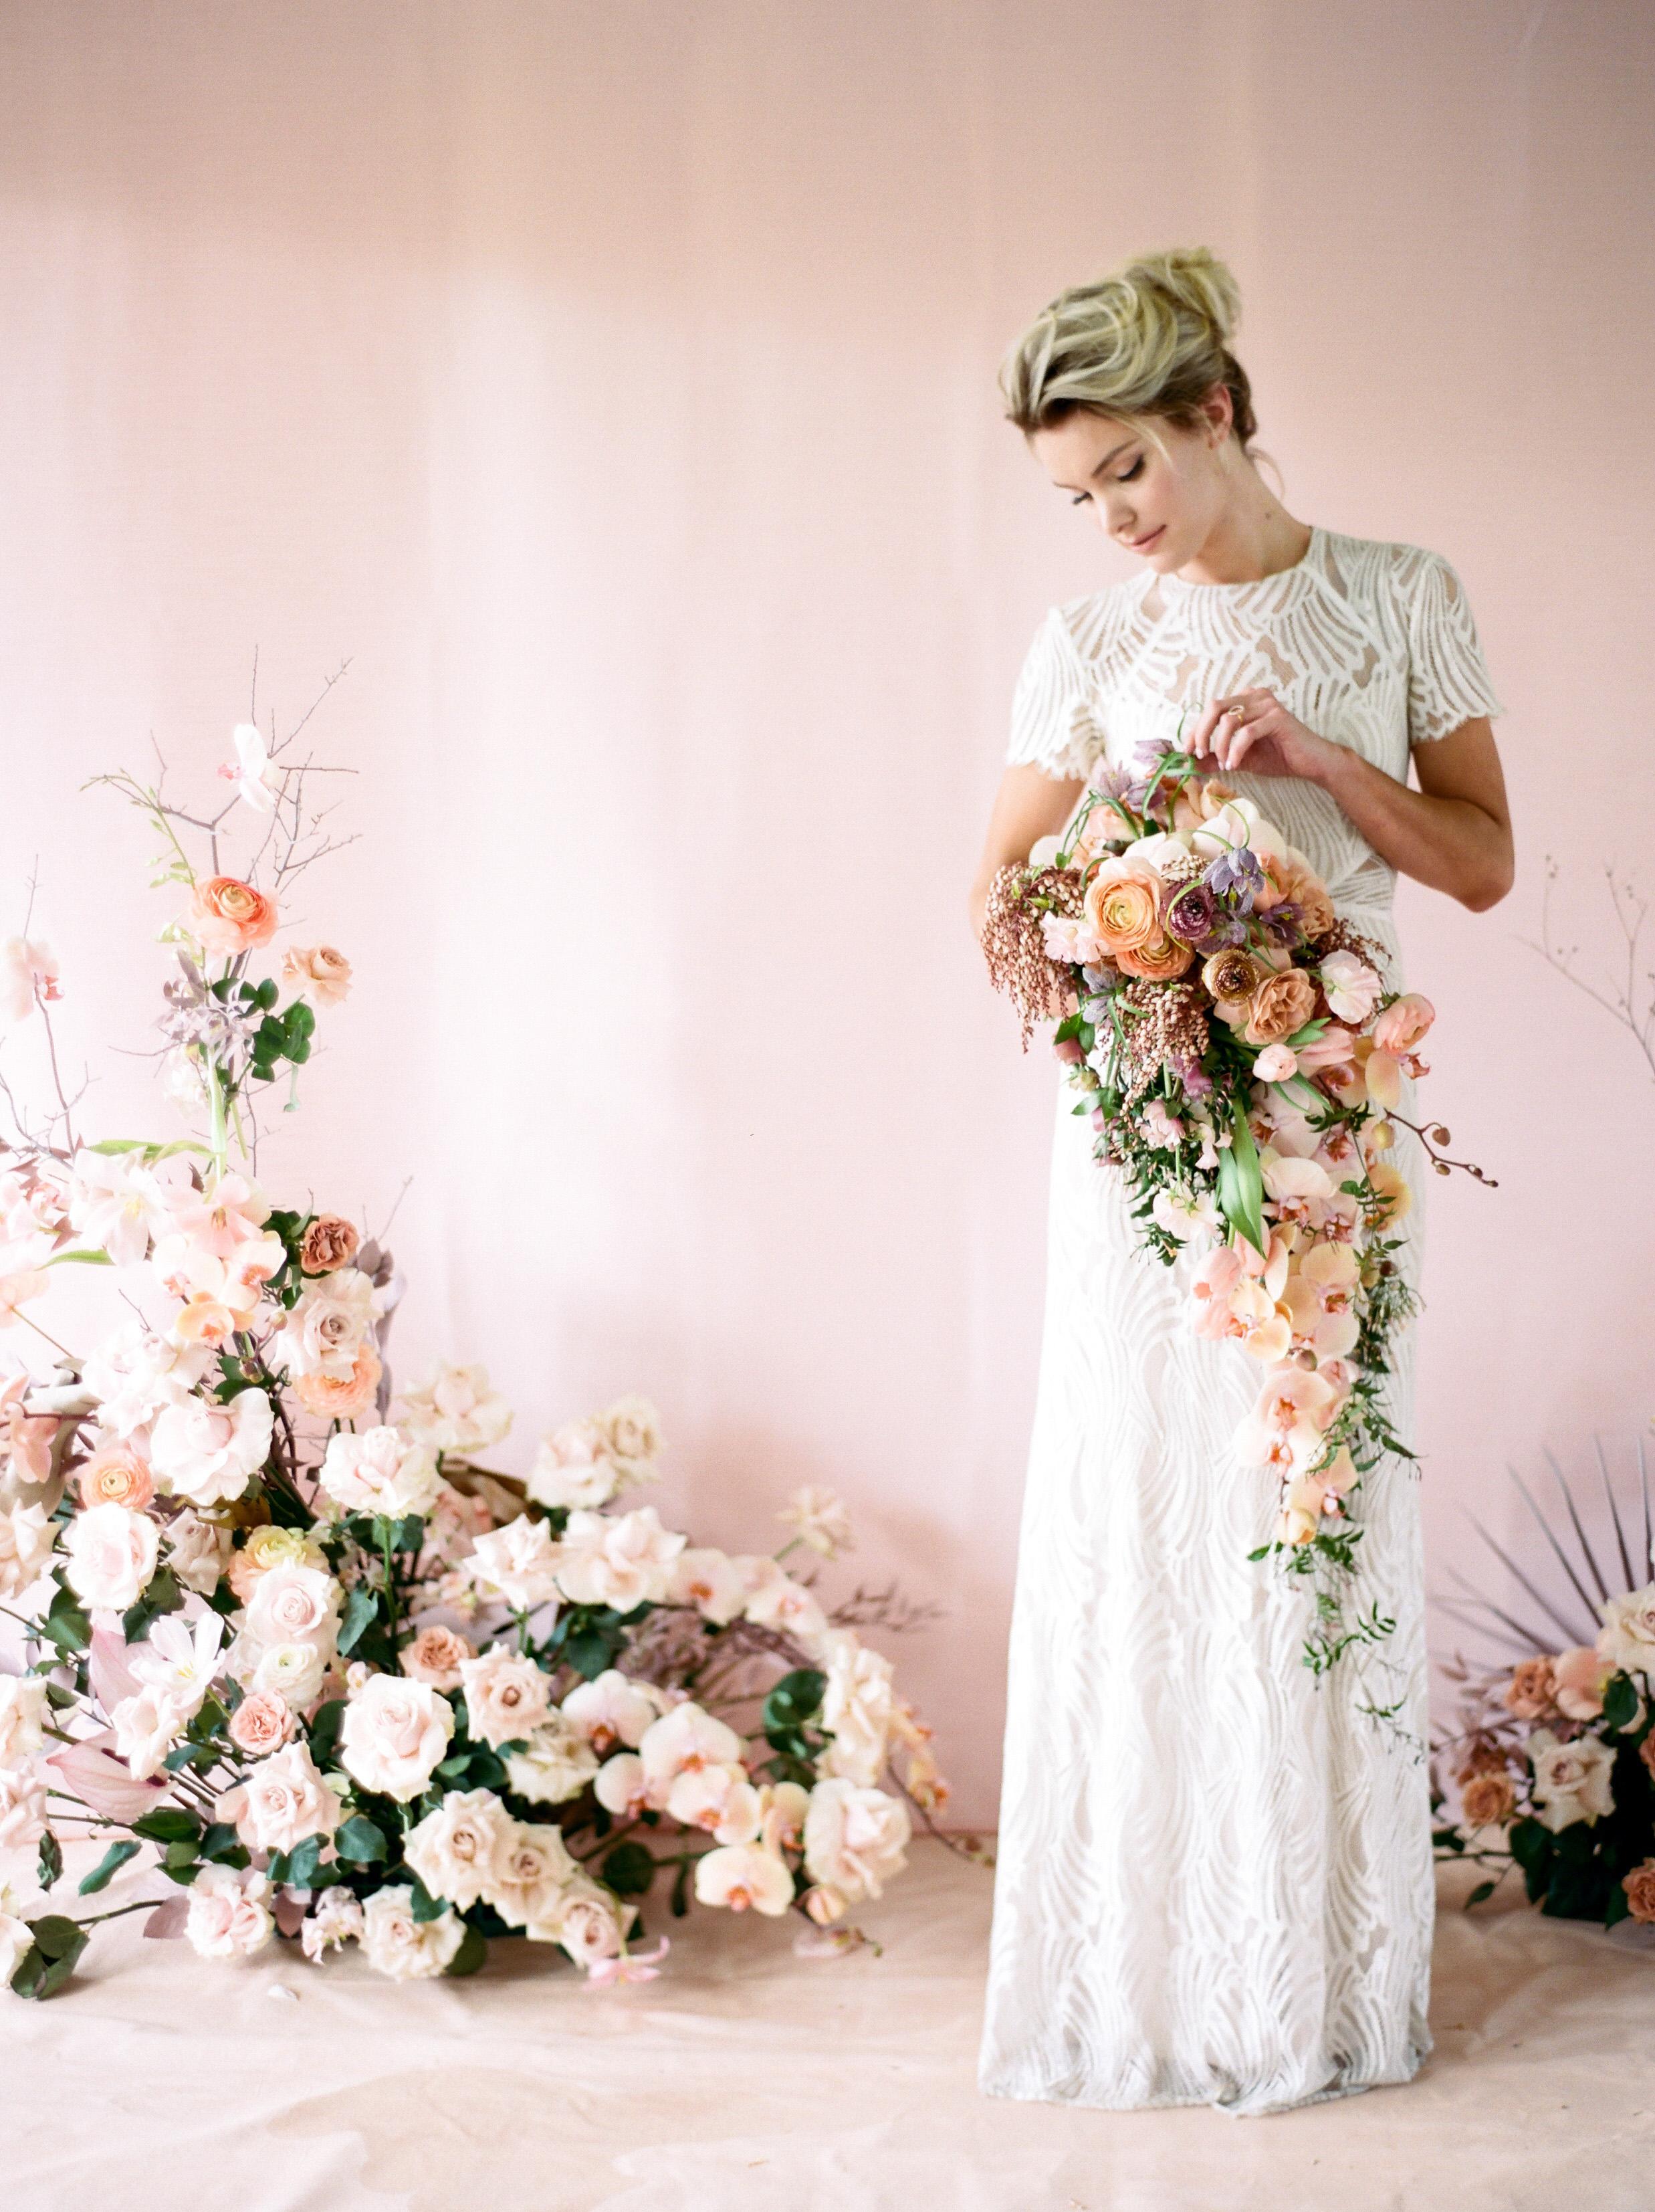 Austin-Wedding-Photography-Prospect-House-Fine-Art-Film-Destination-Dana-Josh-Fernandez-Photography-Dallas-Houston-Luxury-Best-Top-8.jpg